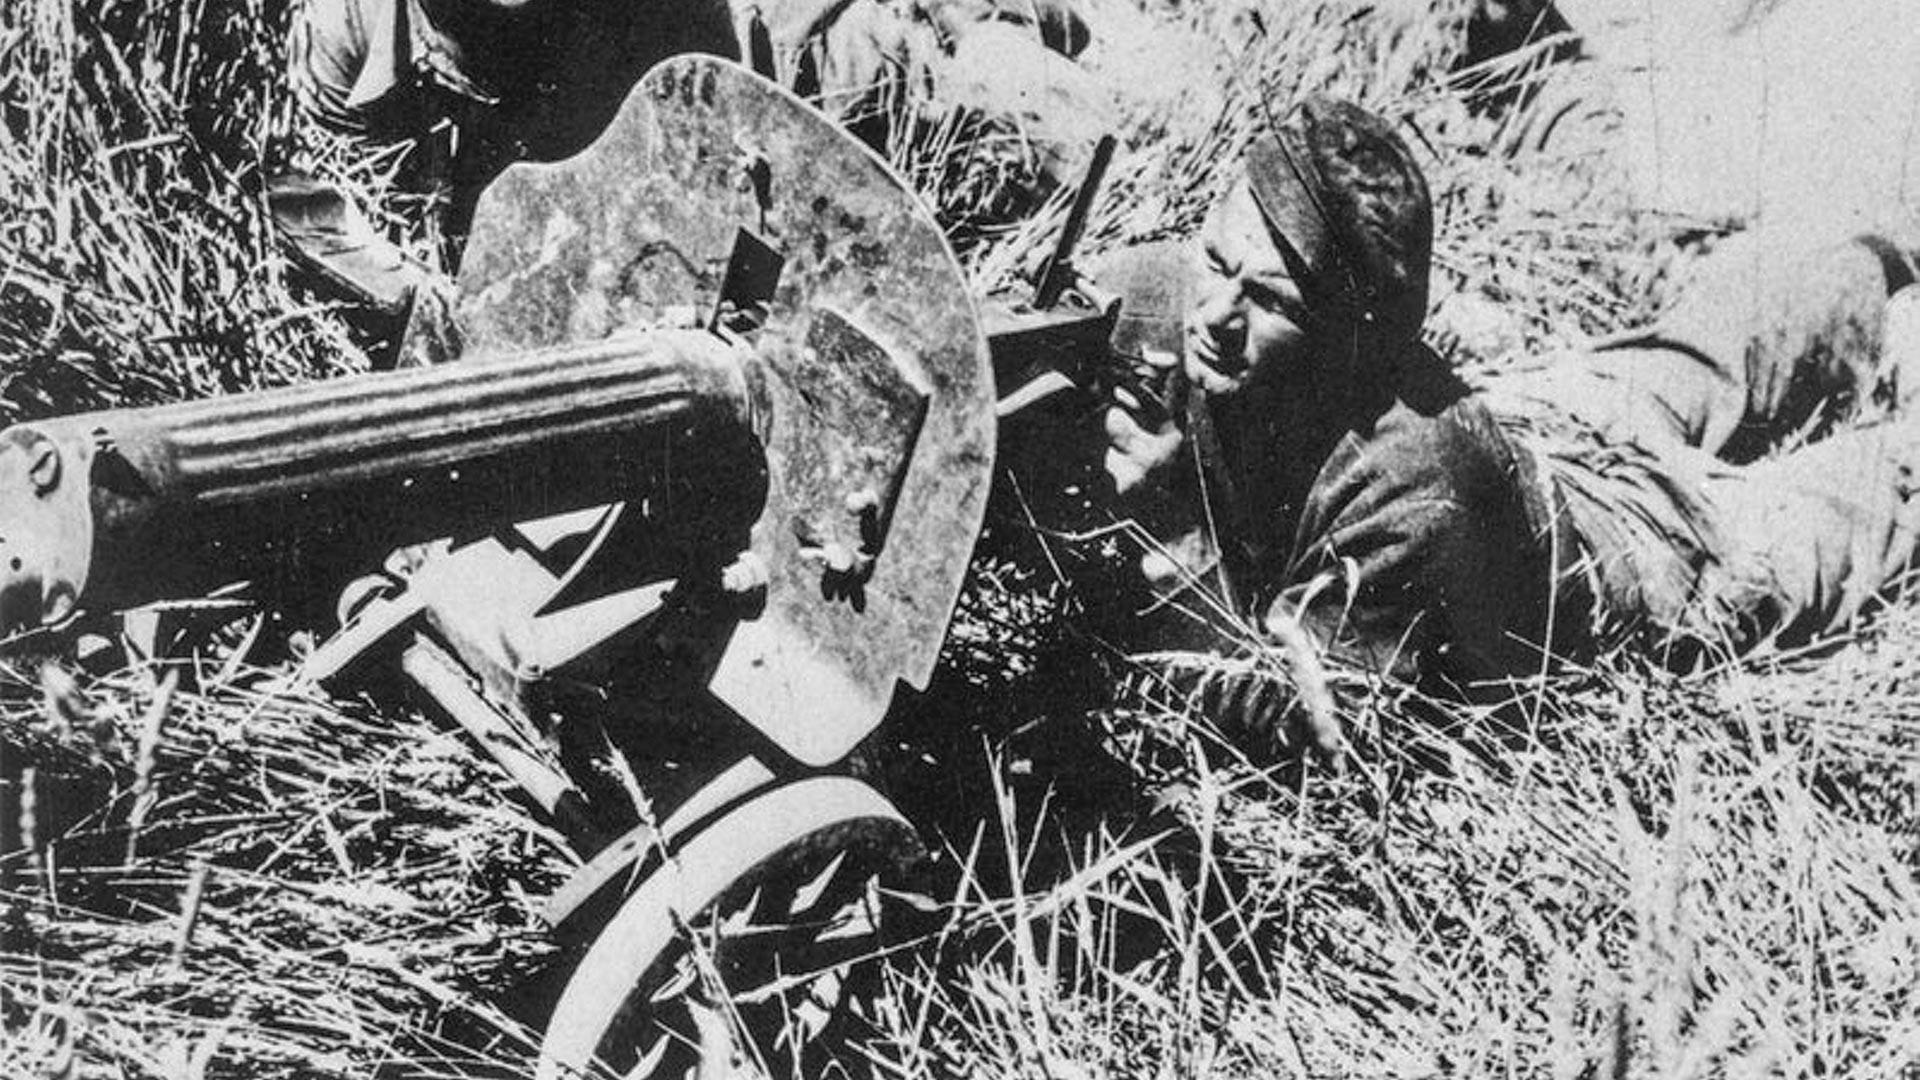 International brigade soldiers with a Soviet Russian machine gun during the Spanish Civil War.